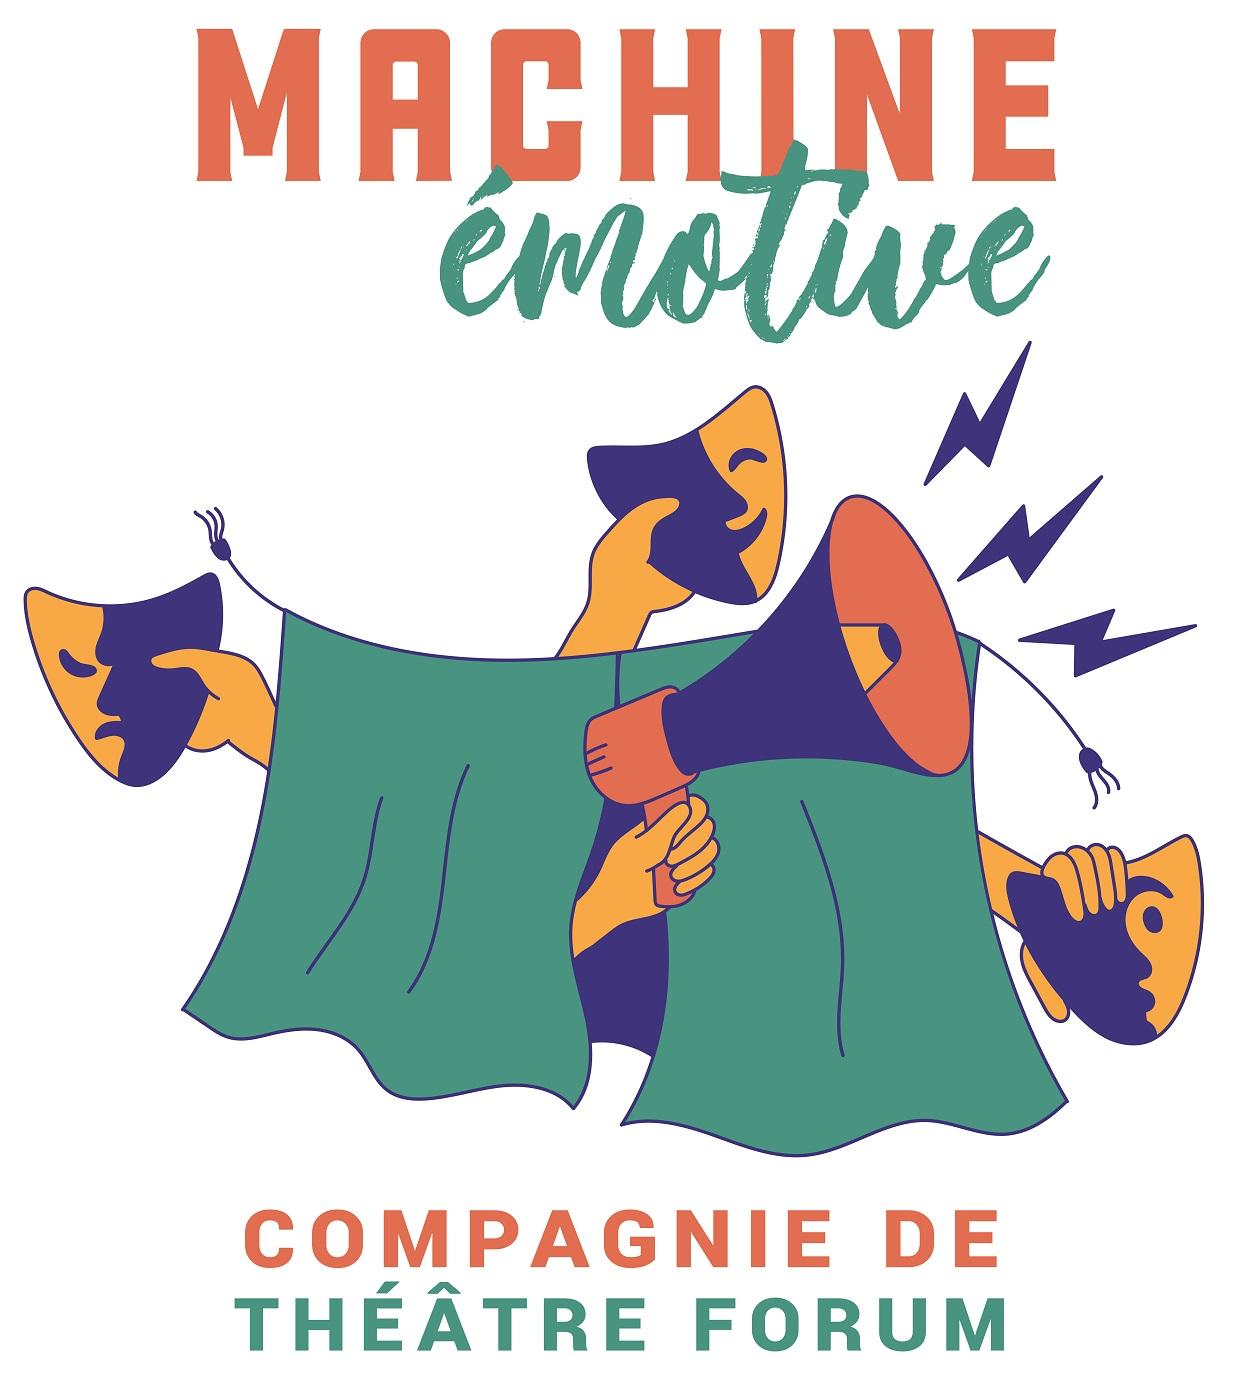 Machine émotive